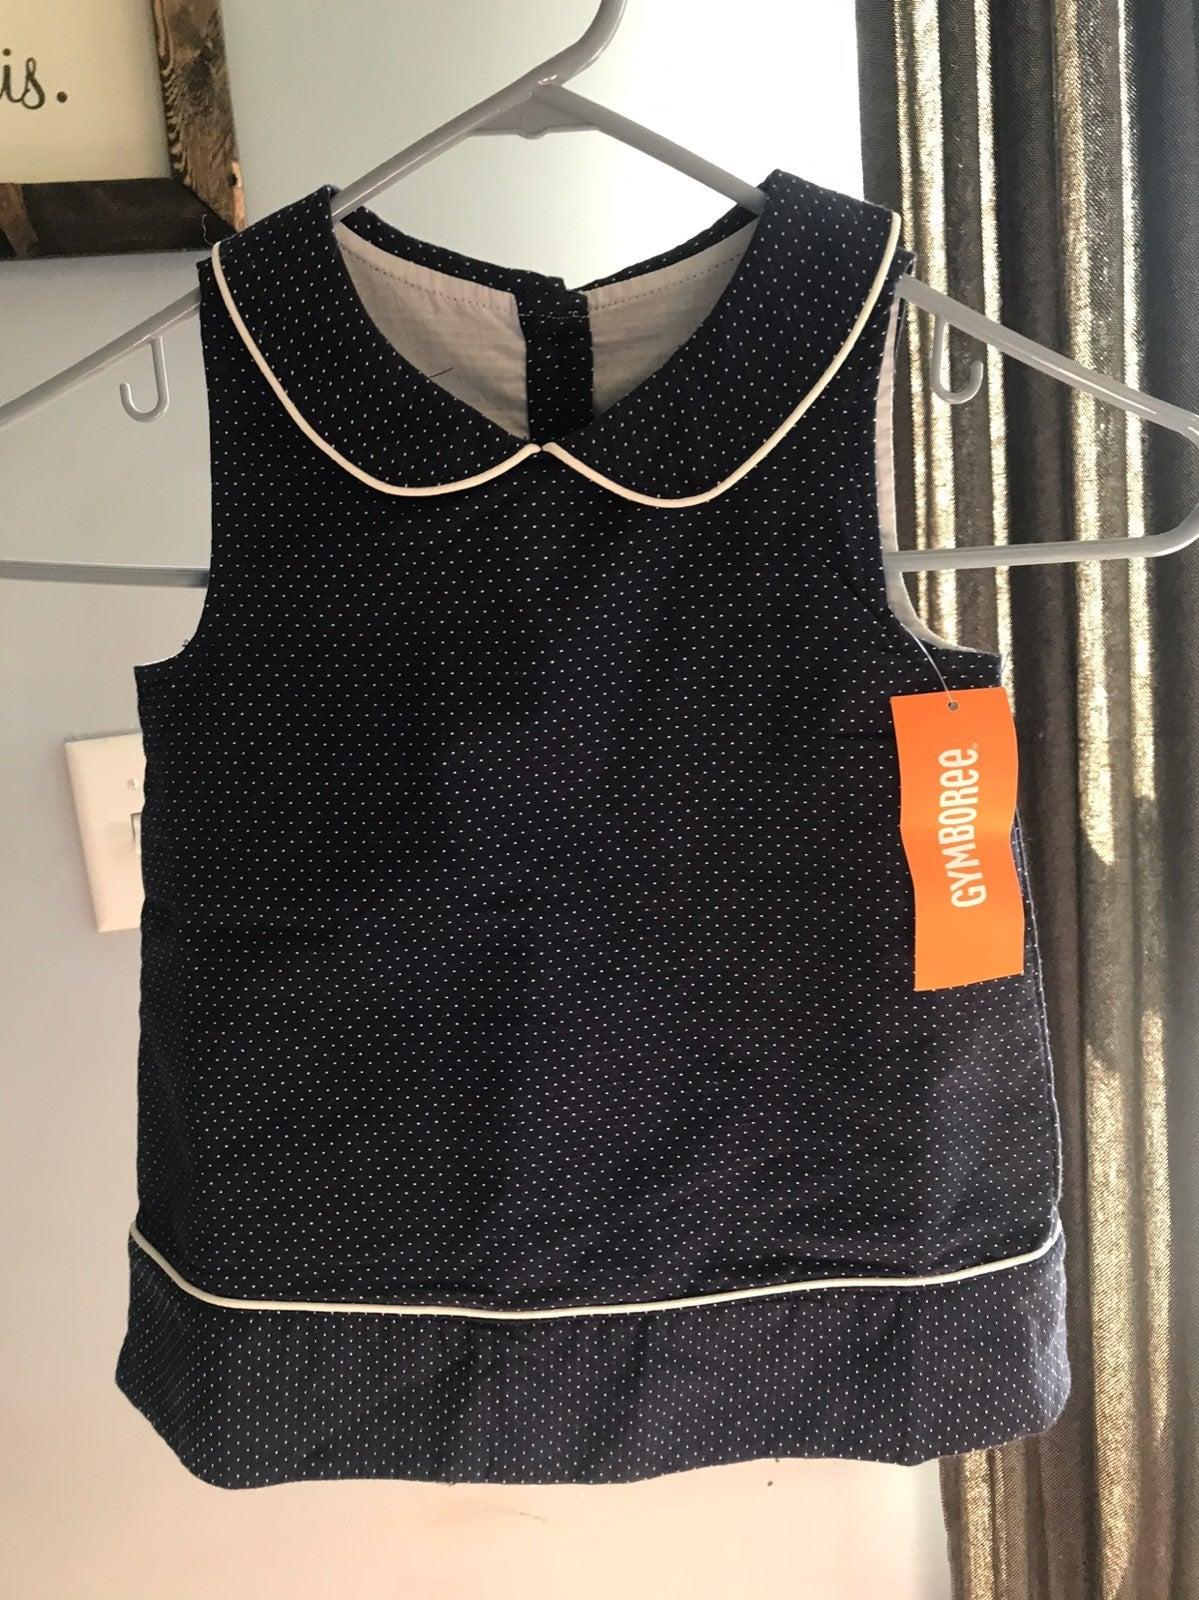 NWT Gymboree Jumper Dress Navy Polka Dot